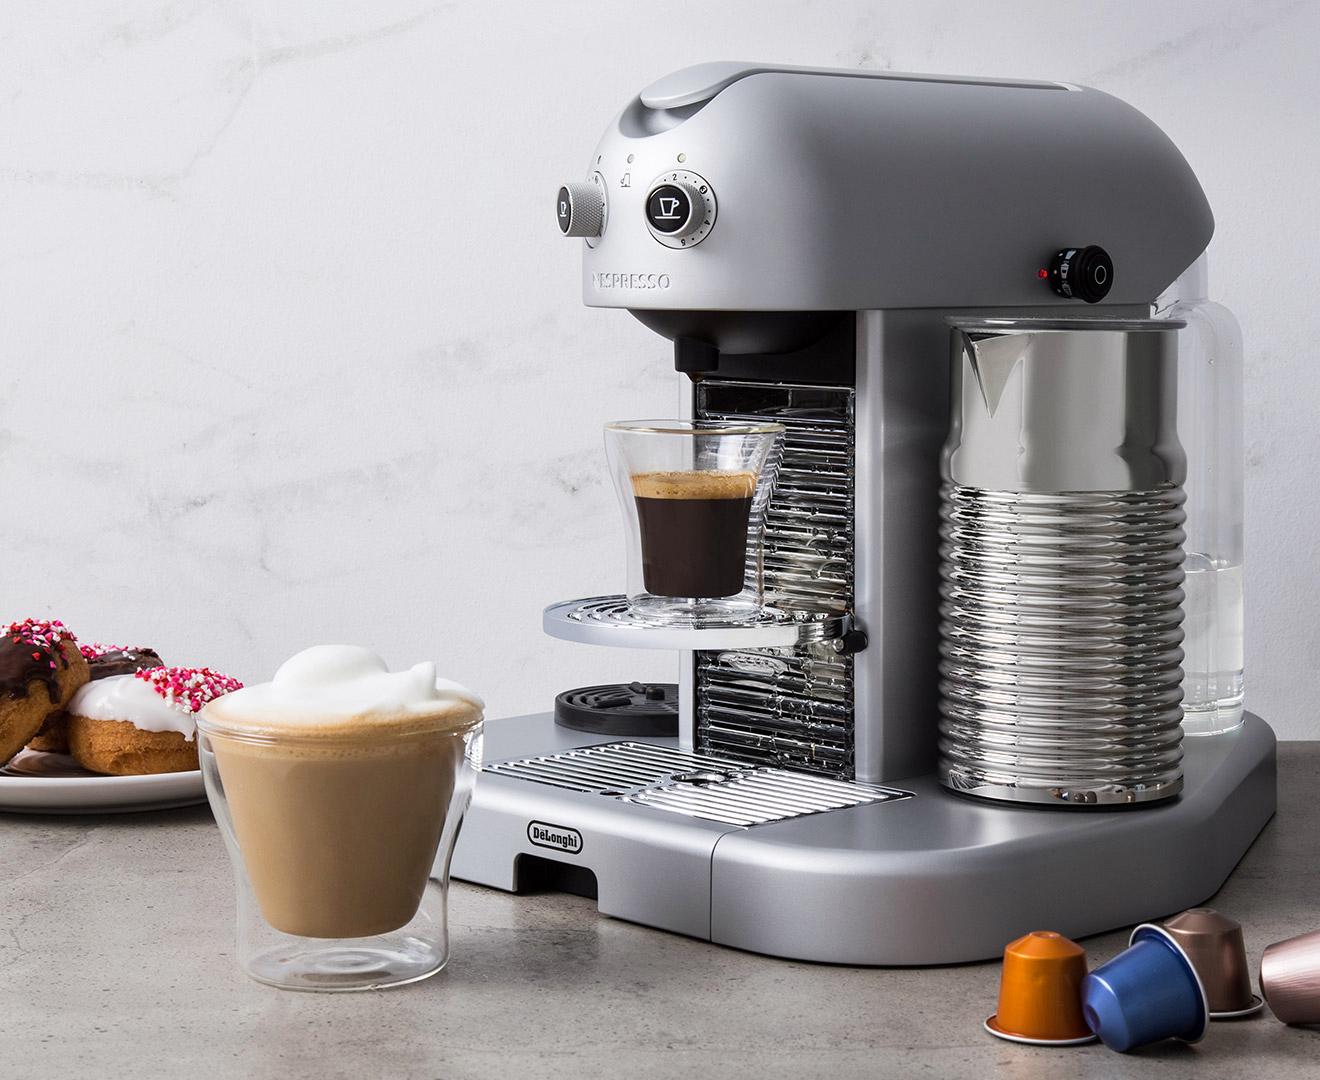 d longhi nespresso gran maestria coffee machine silver. Black Bedroom Furniture Sets. Home Design Ideas